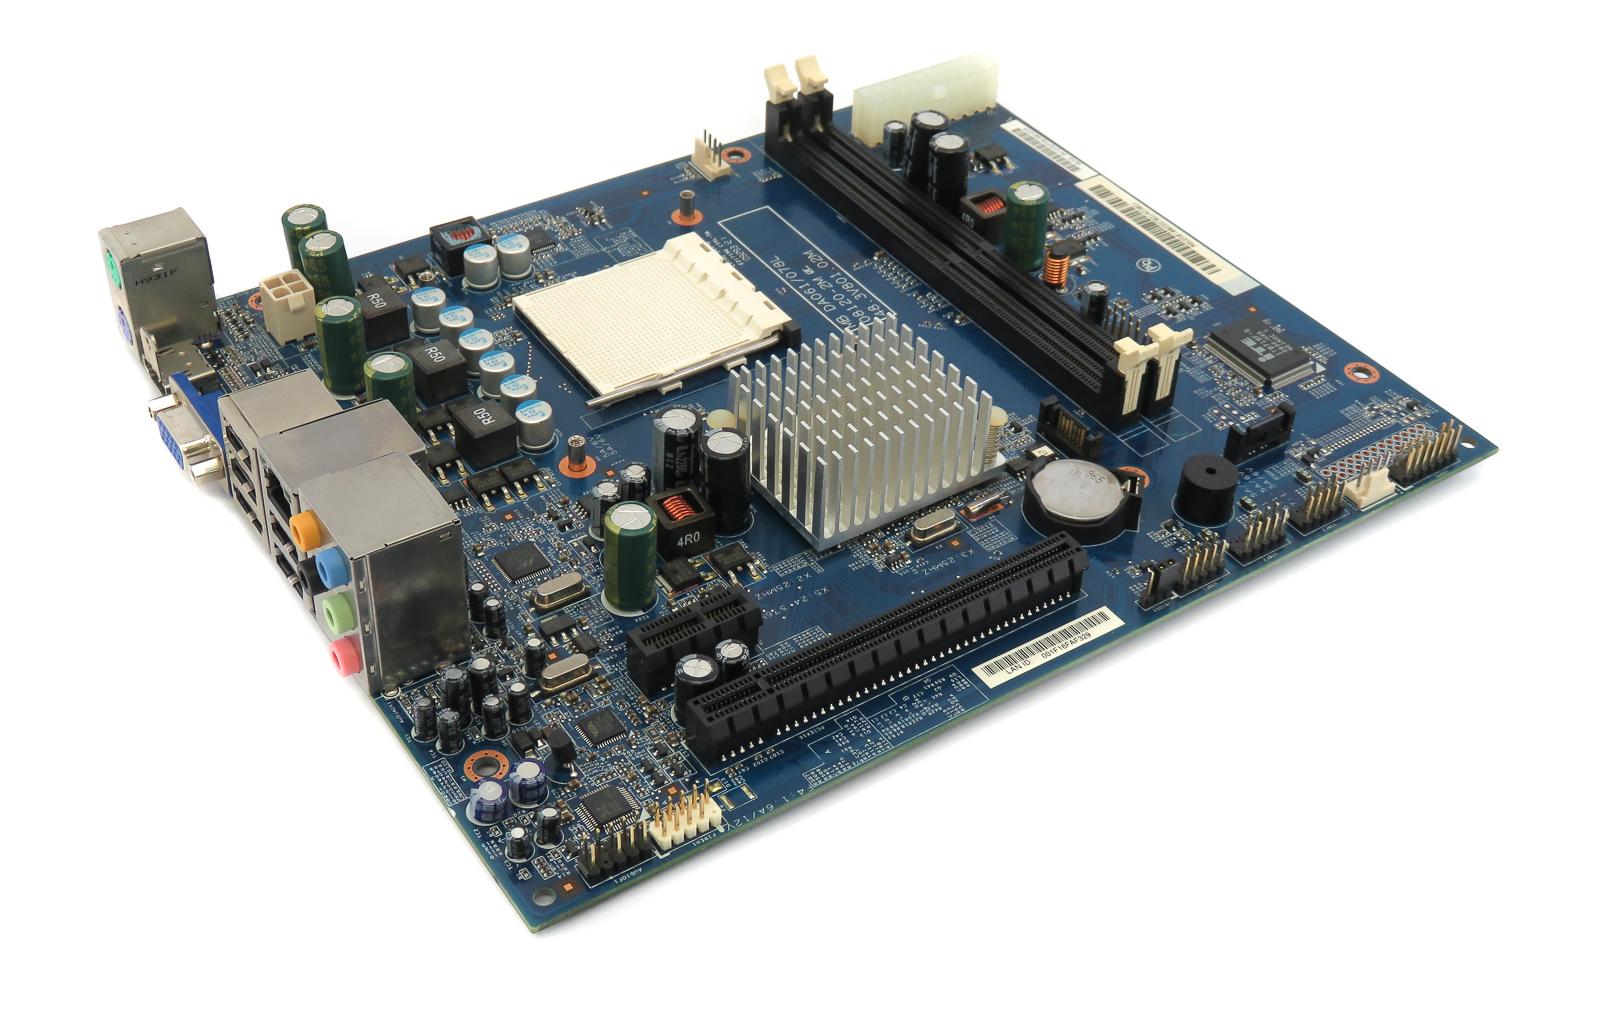 Packard Bell AMD Socket AM2 Motherboard DA061/078L - MB.U2501.002